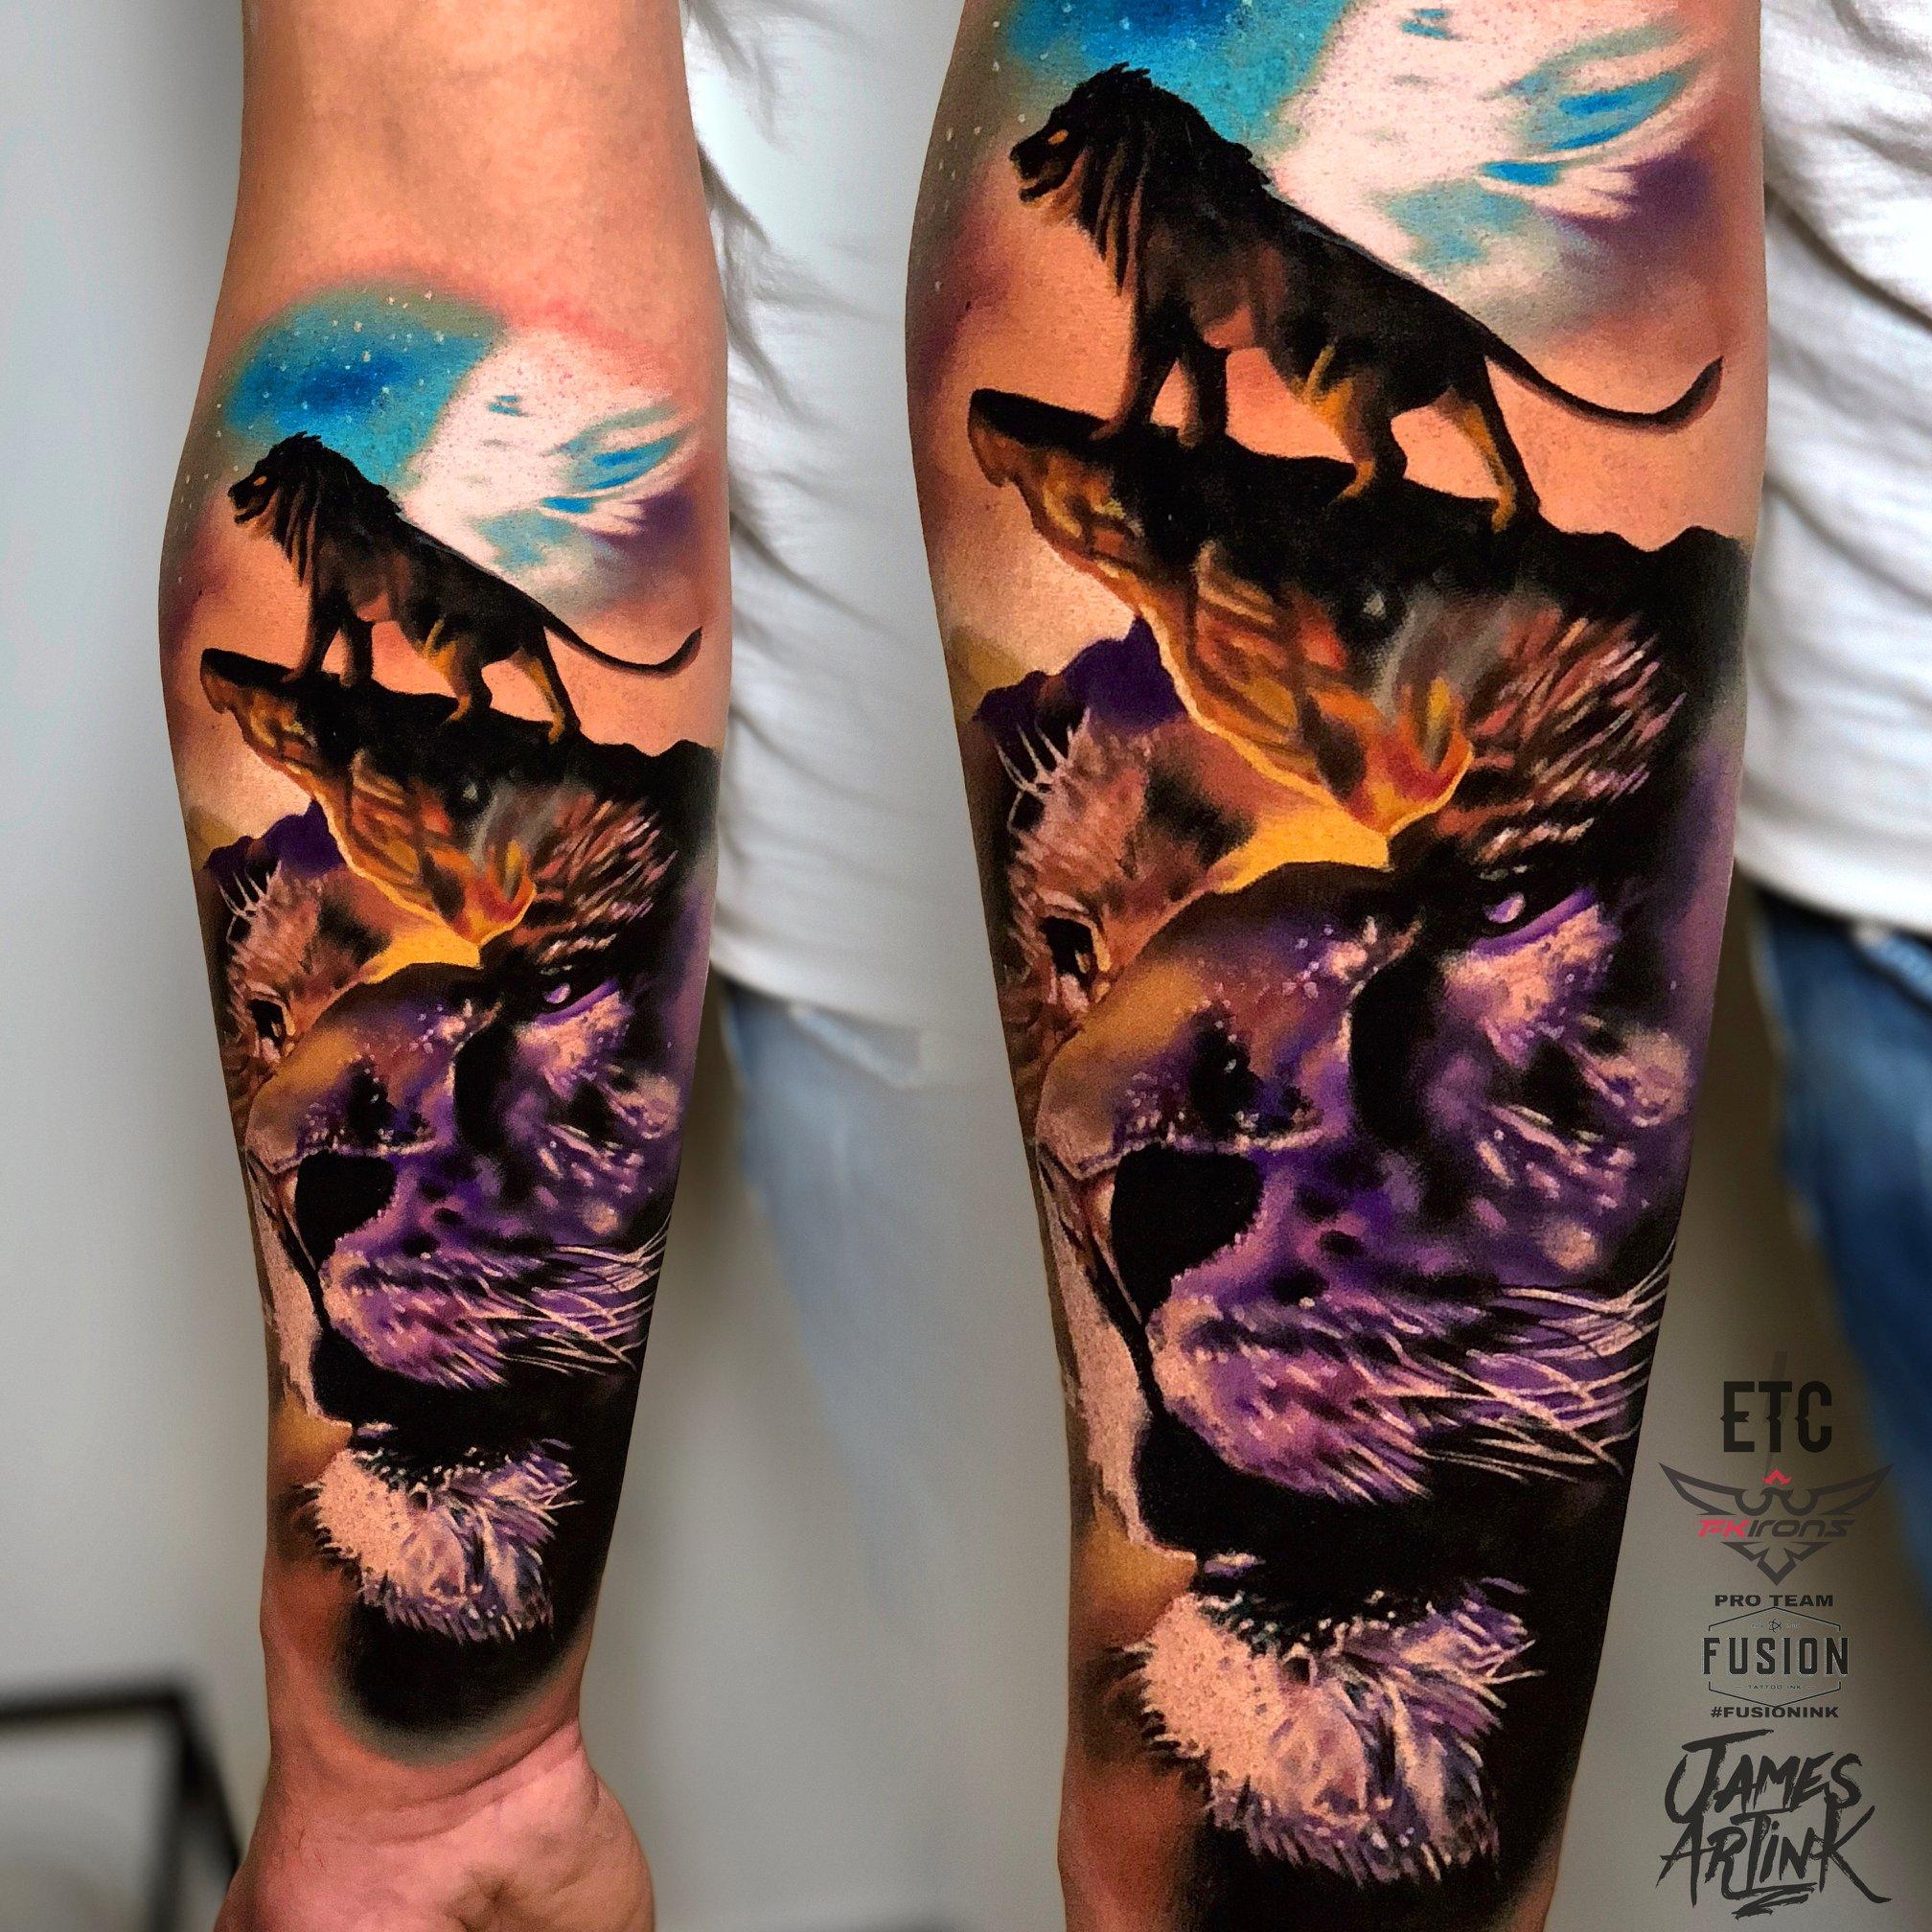 James Artink inksearch tattoo